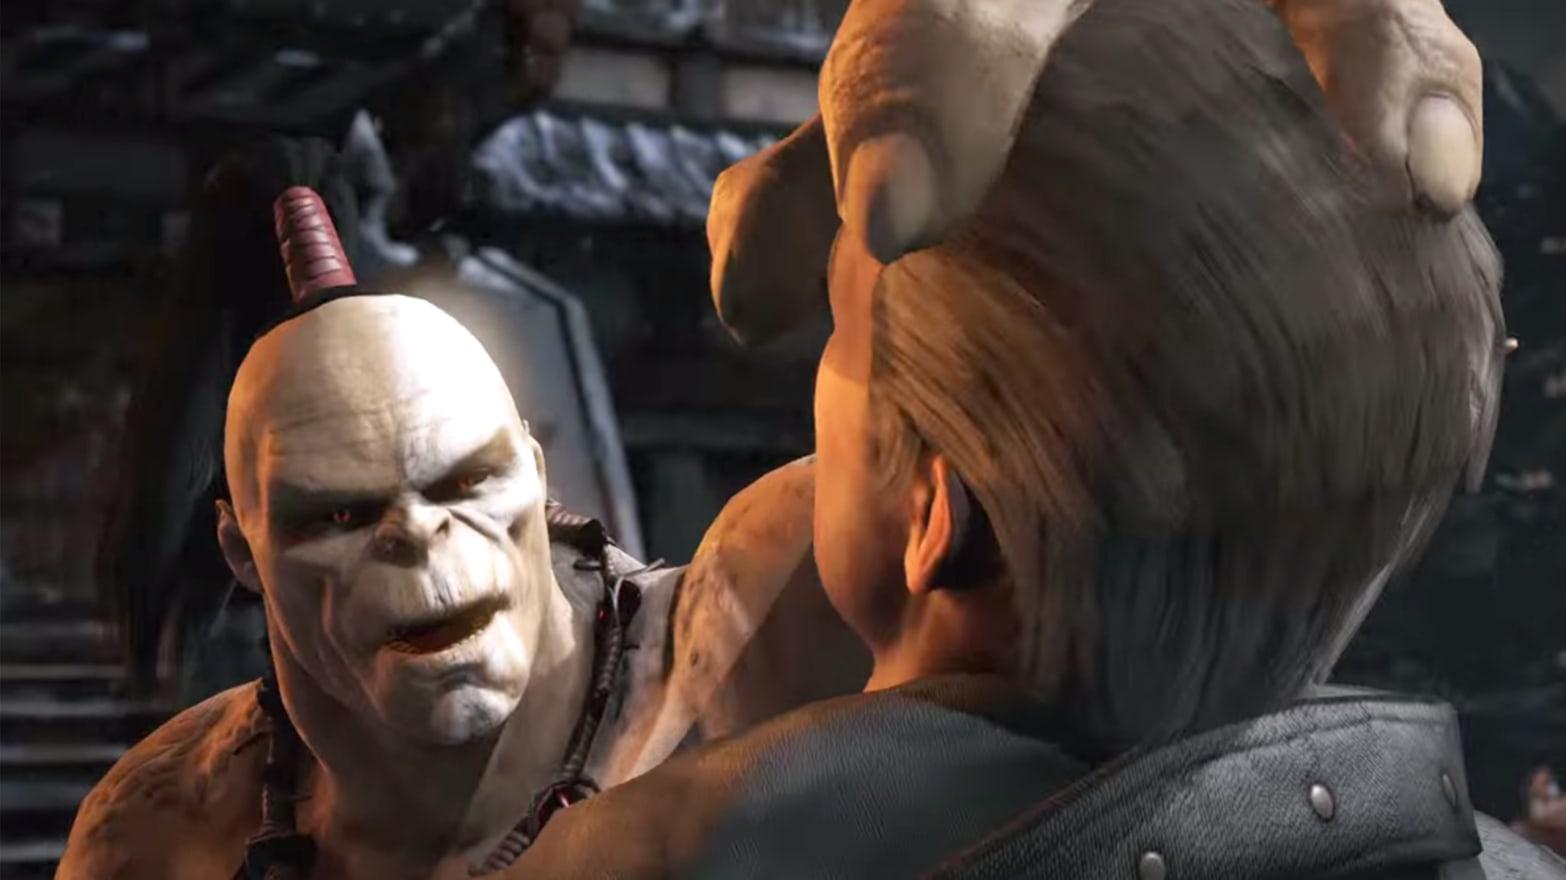 Mortal Kombat X The Most Violent Video Game Ever